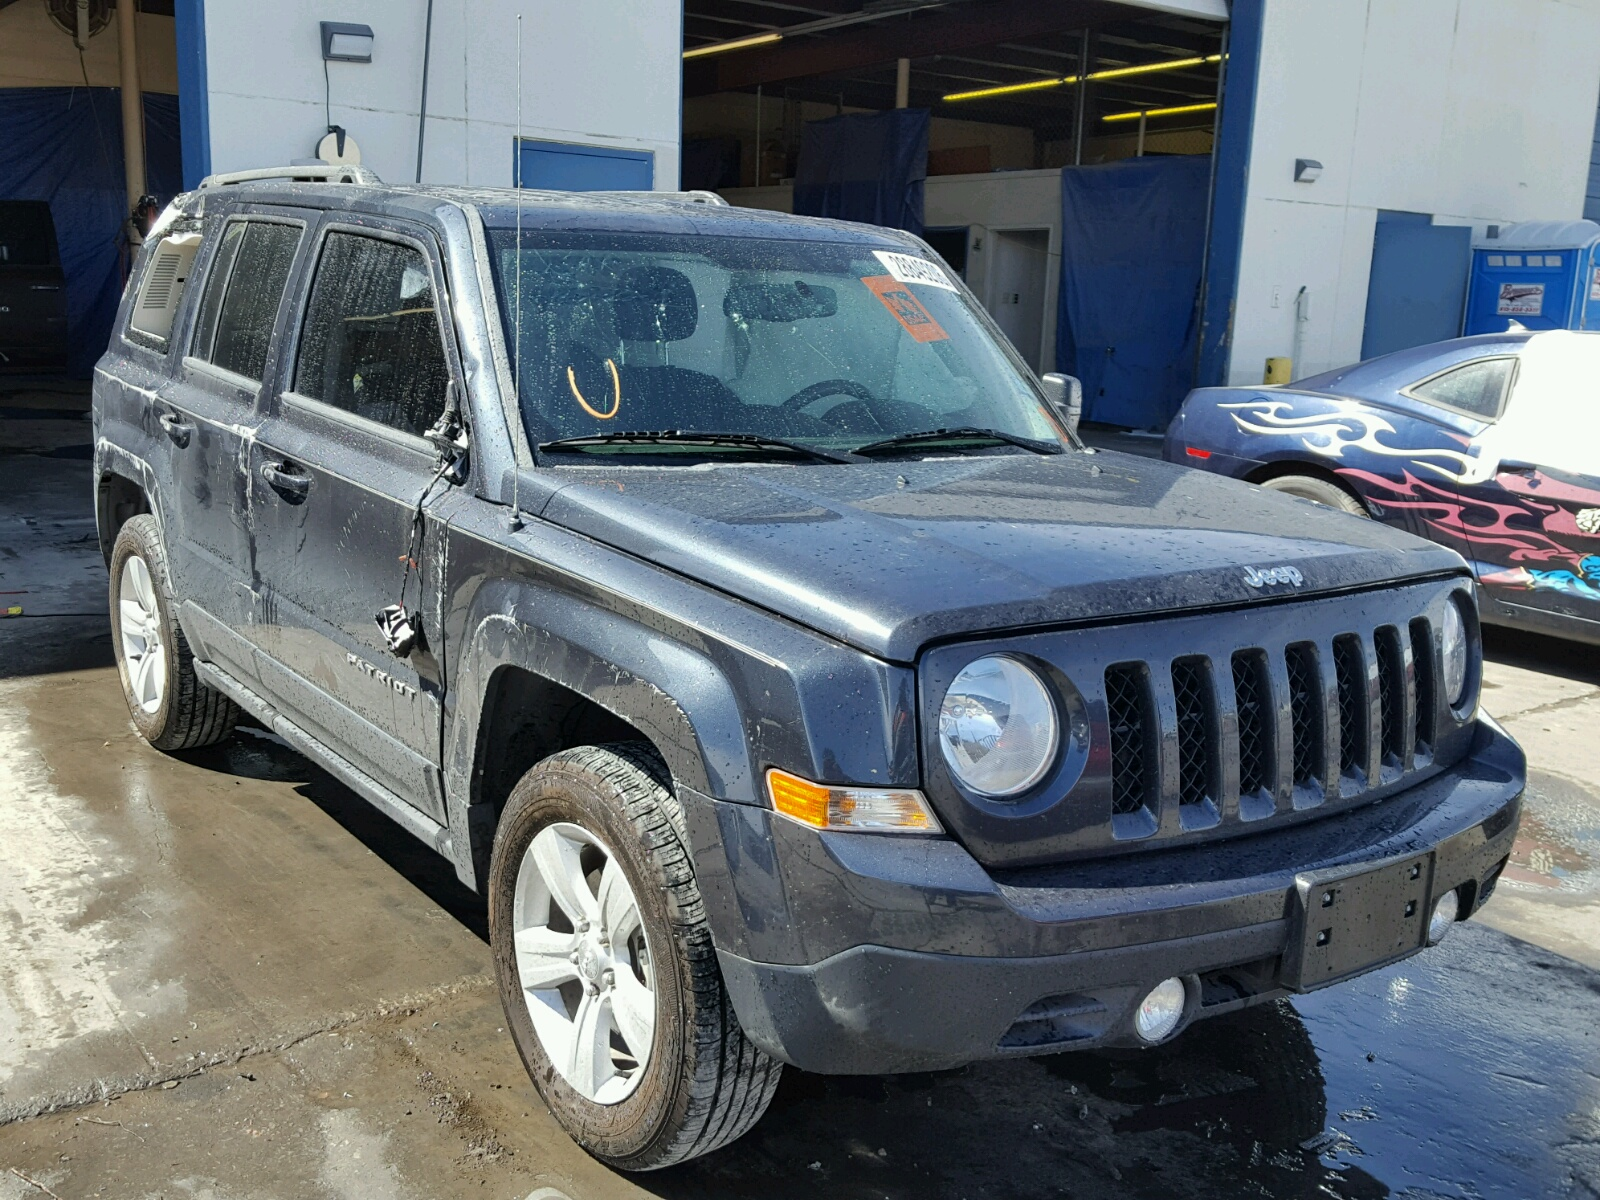 edmonton used sale for alberta inventory jeep patriot in